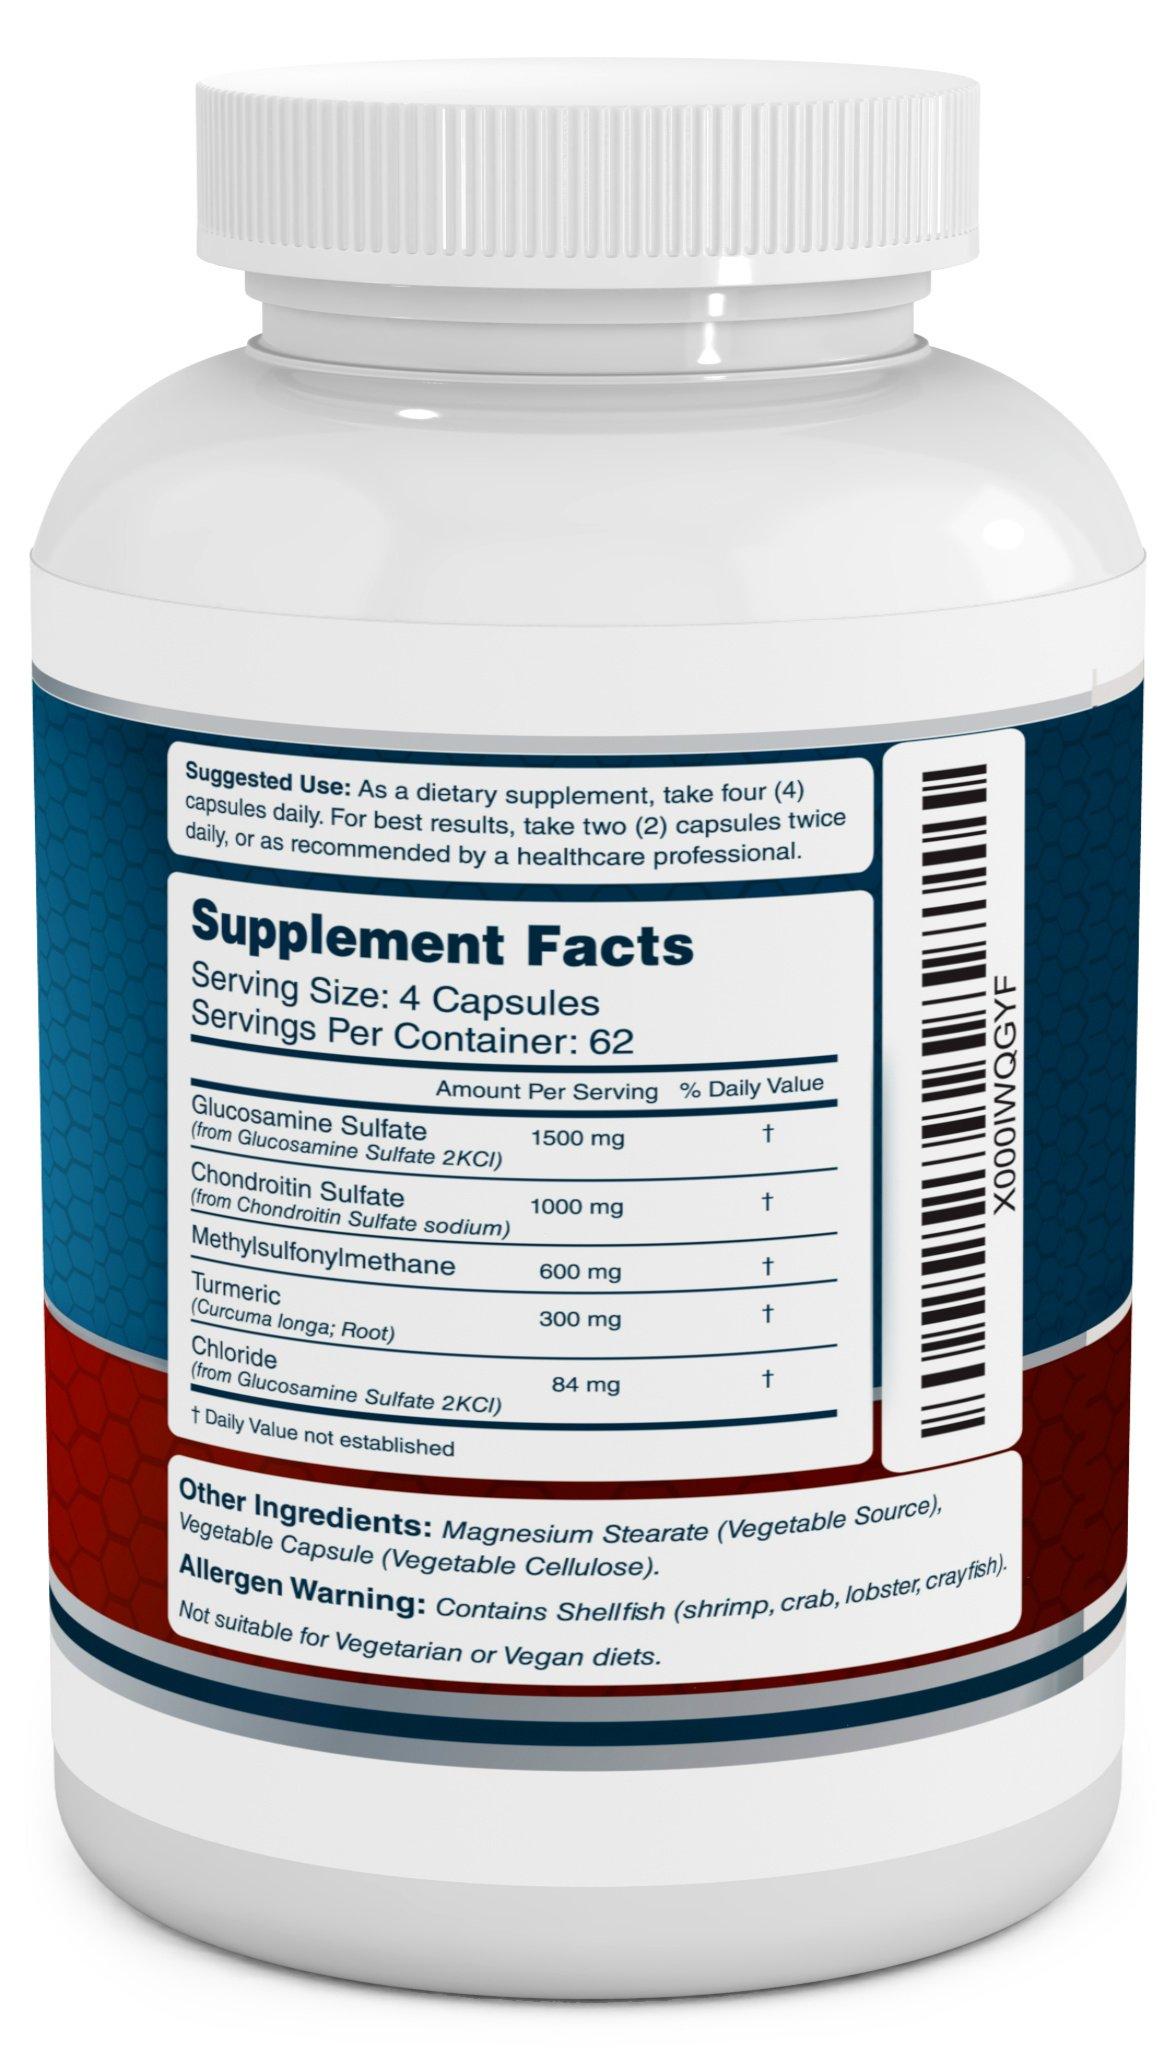 Glucosamine Chondroitin, MSM & Turmeric Dietary Supplement - 250 Capsules by VitaBreeze (Image #2)